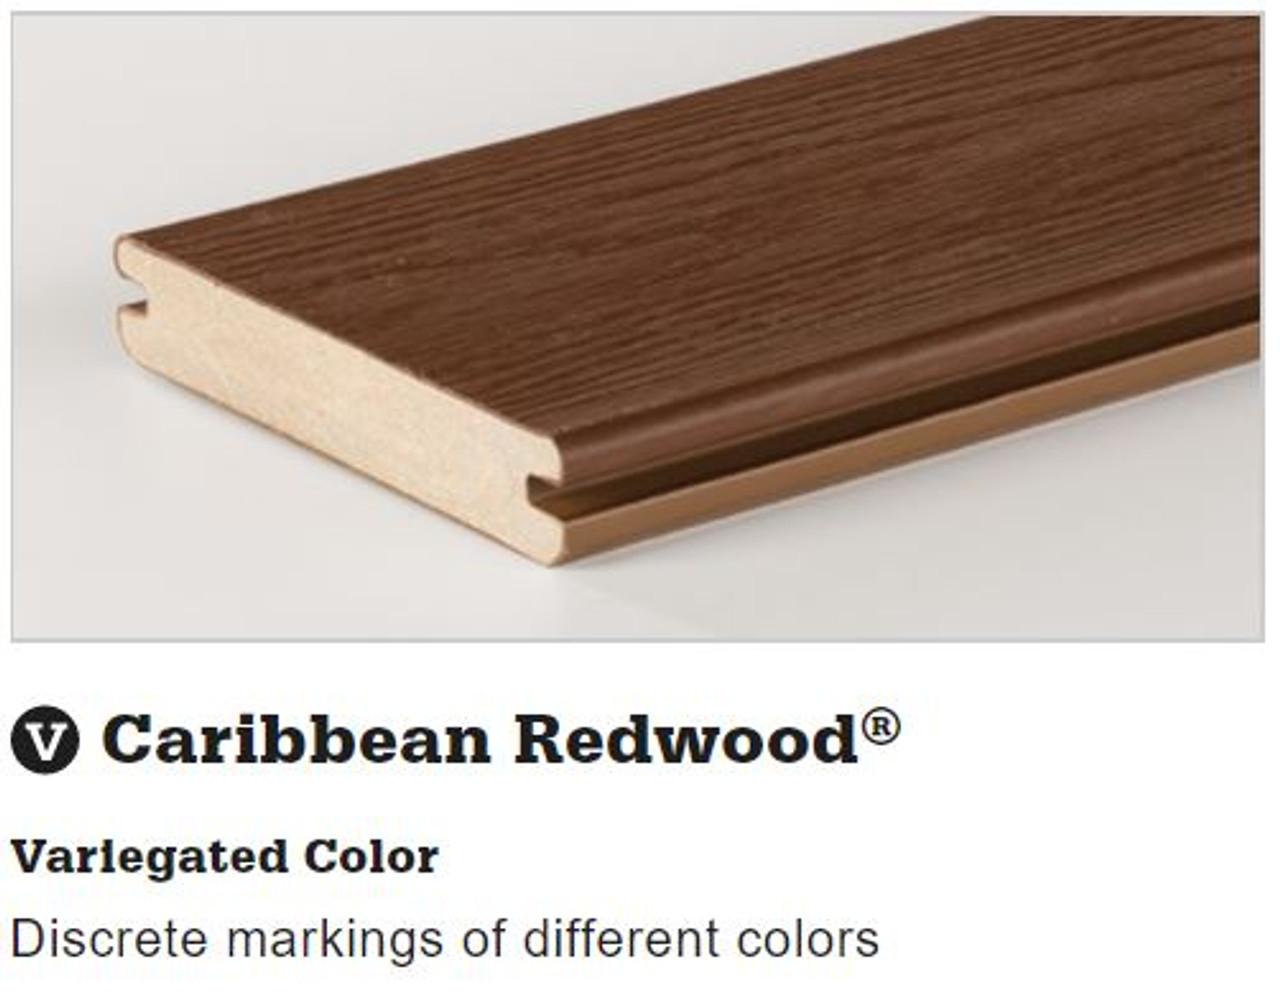 TimberTech Tropical Deck Board in Caribbean Redwood